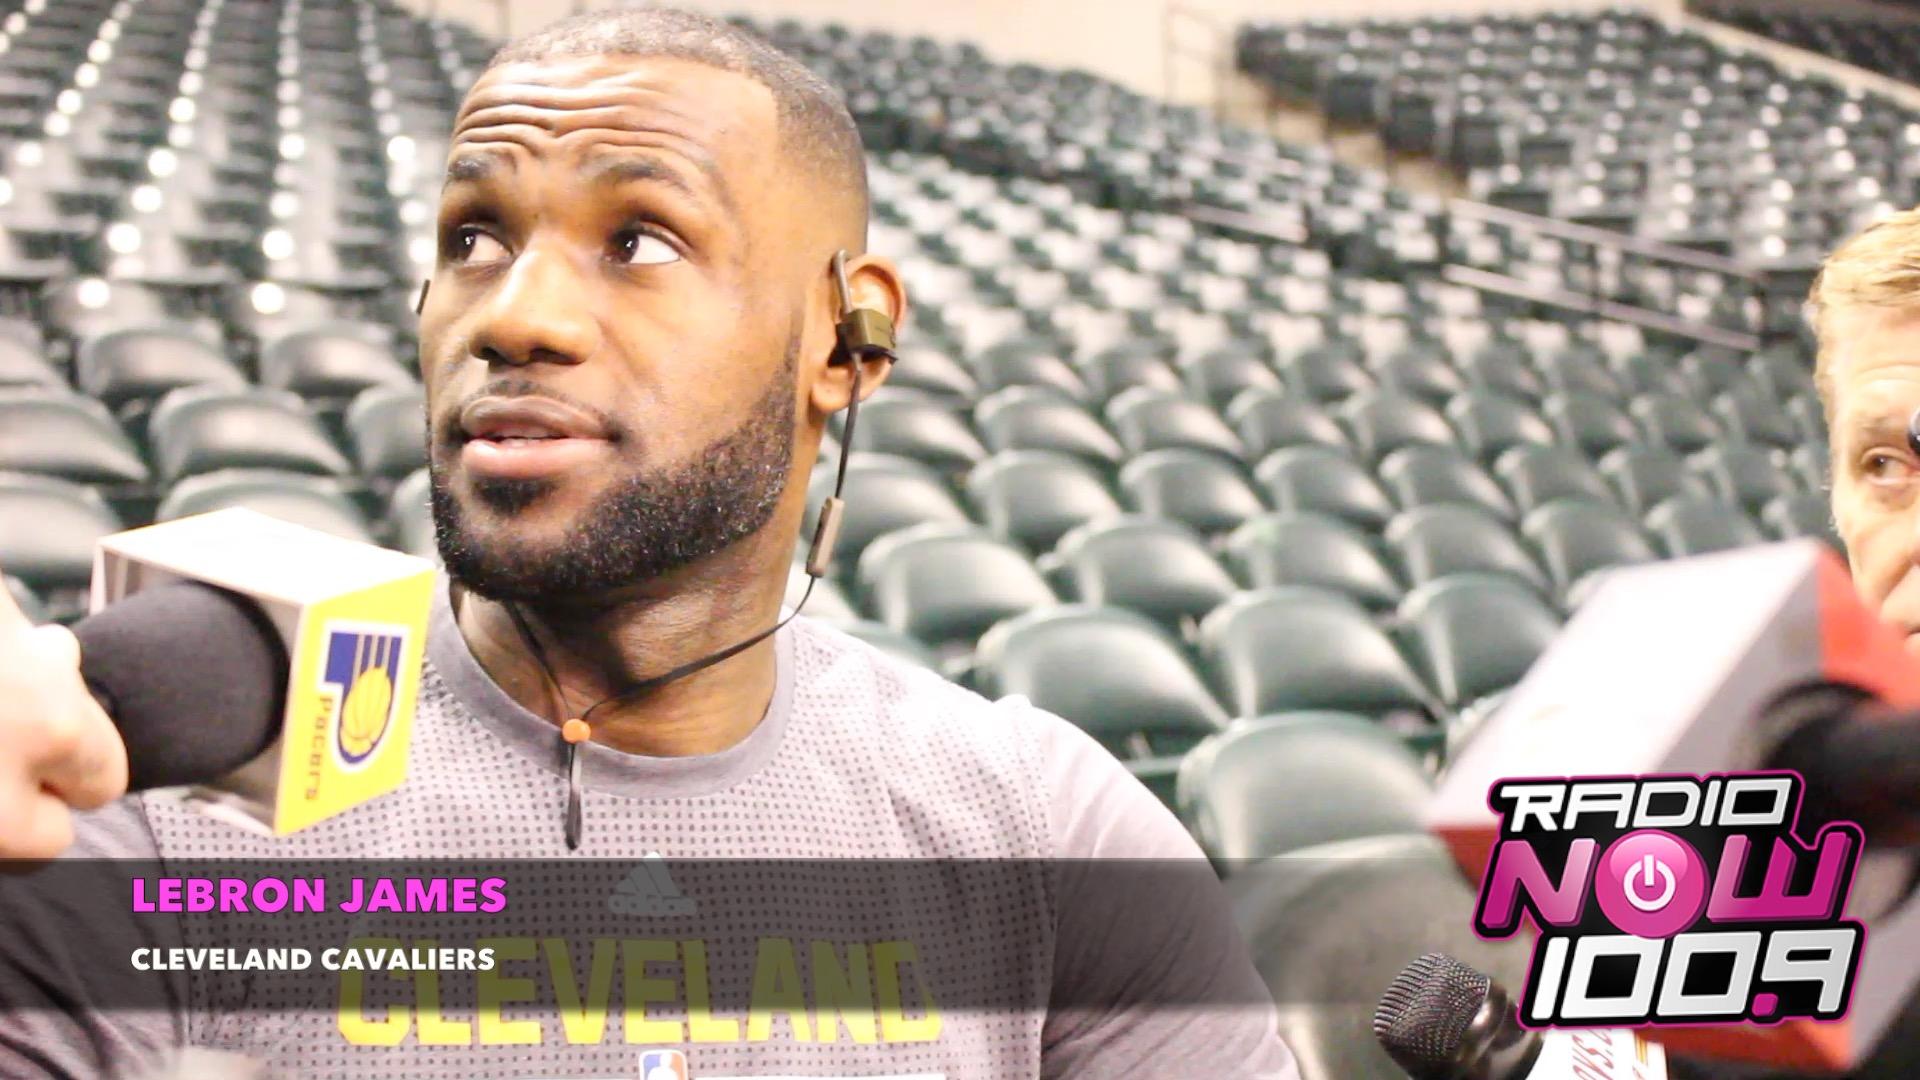 LeBron James - Cavs/Pacers